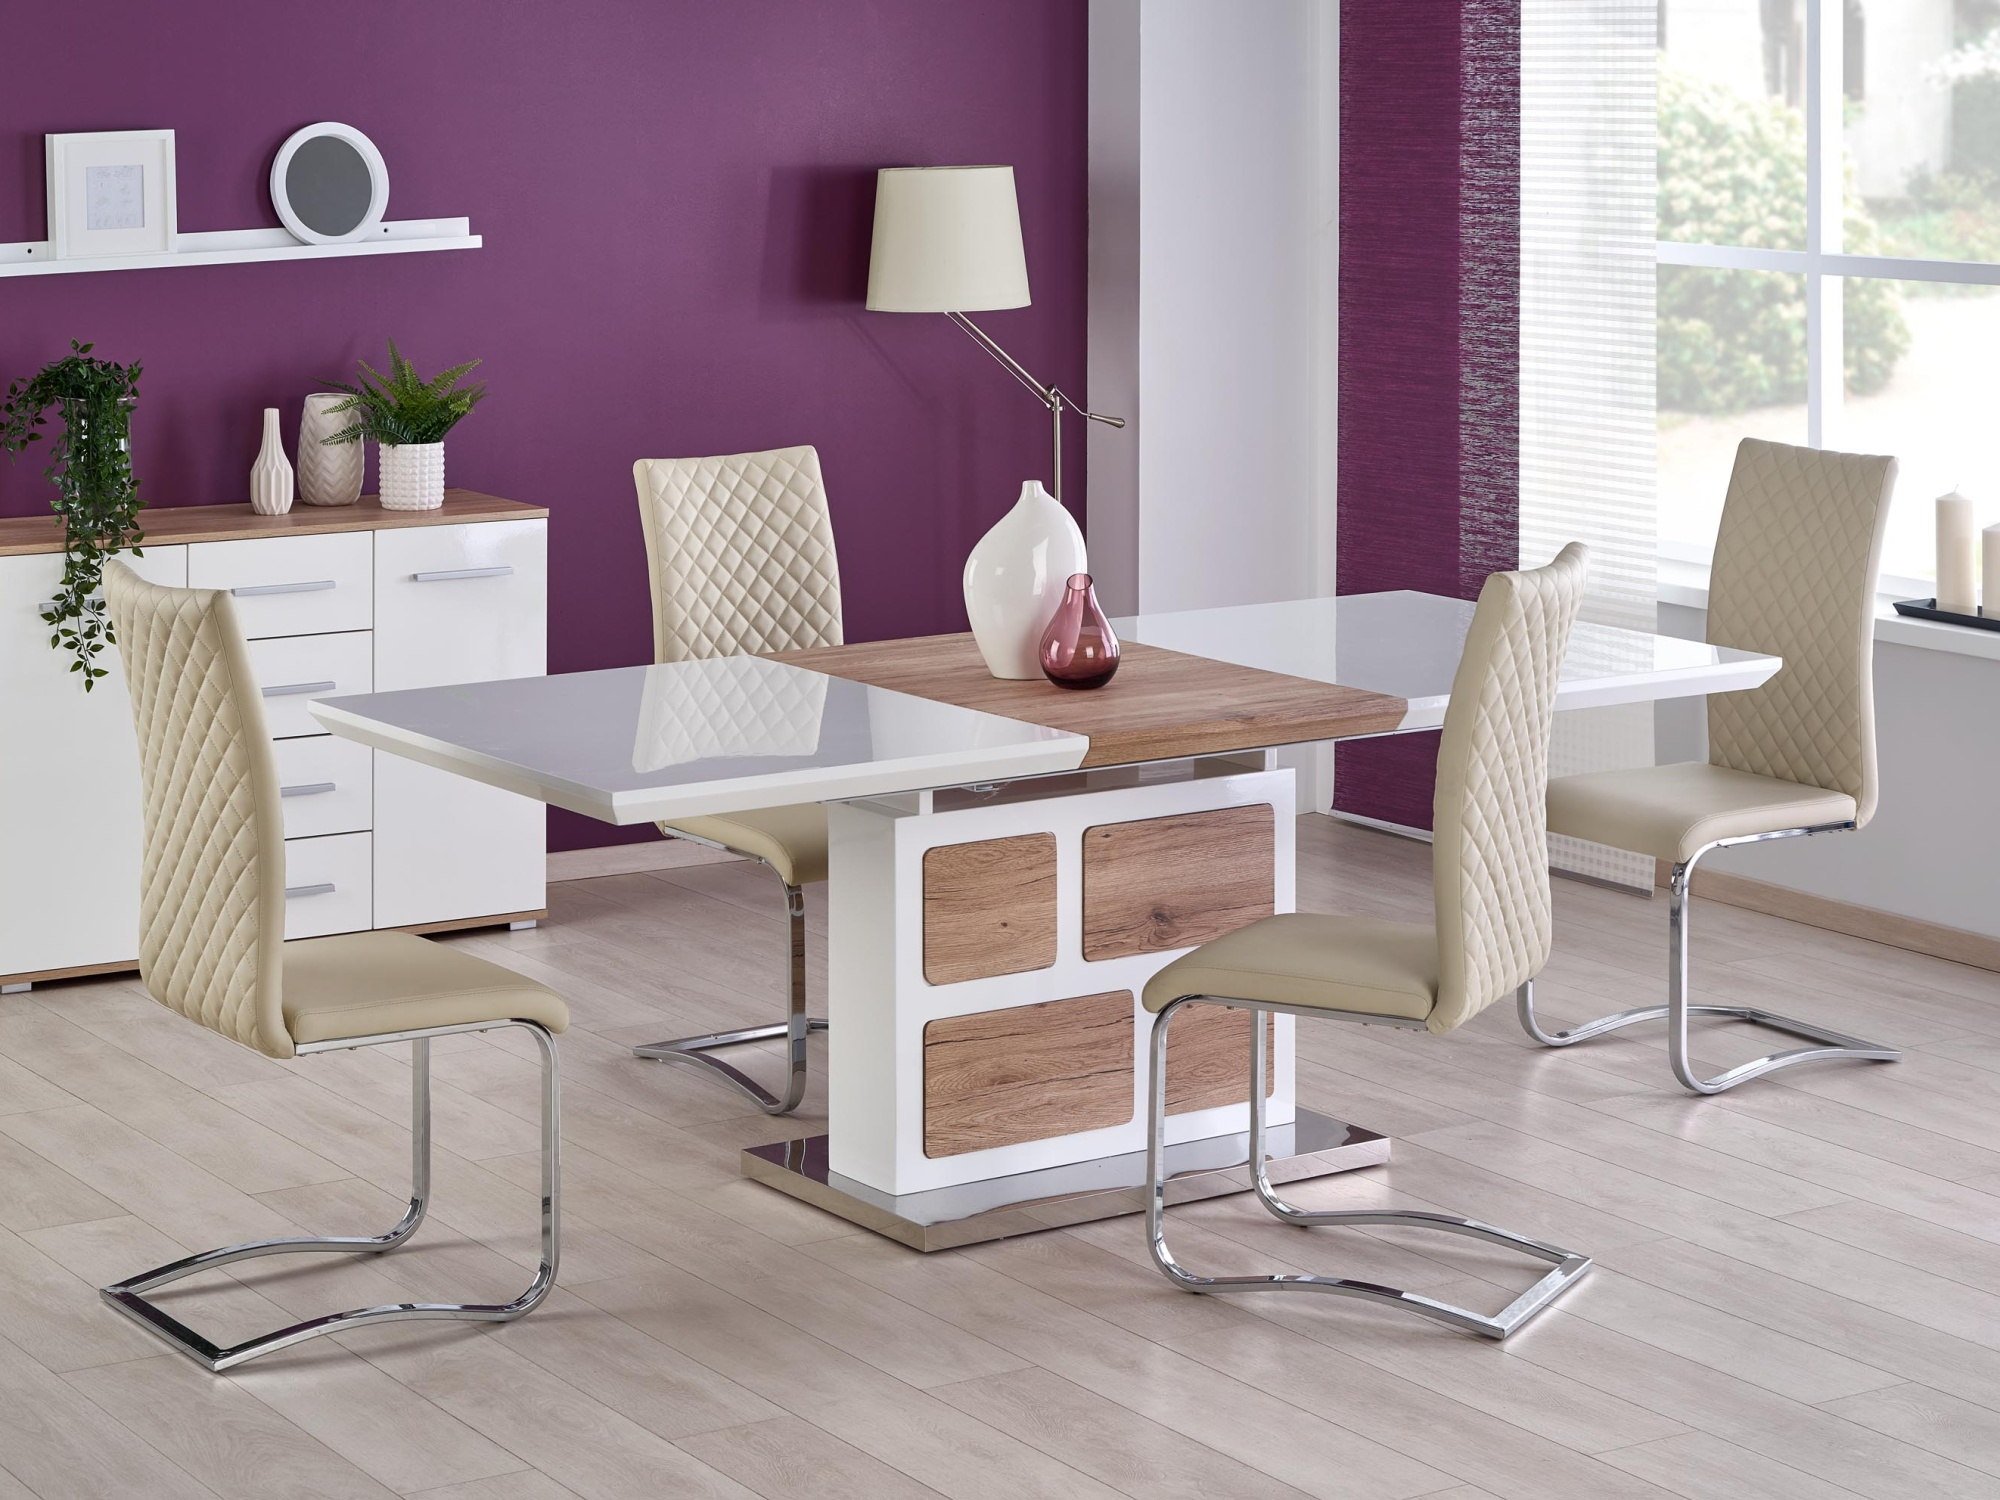 Rozkládací jídelní stůl DOMUS, bílá/dub san remo